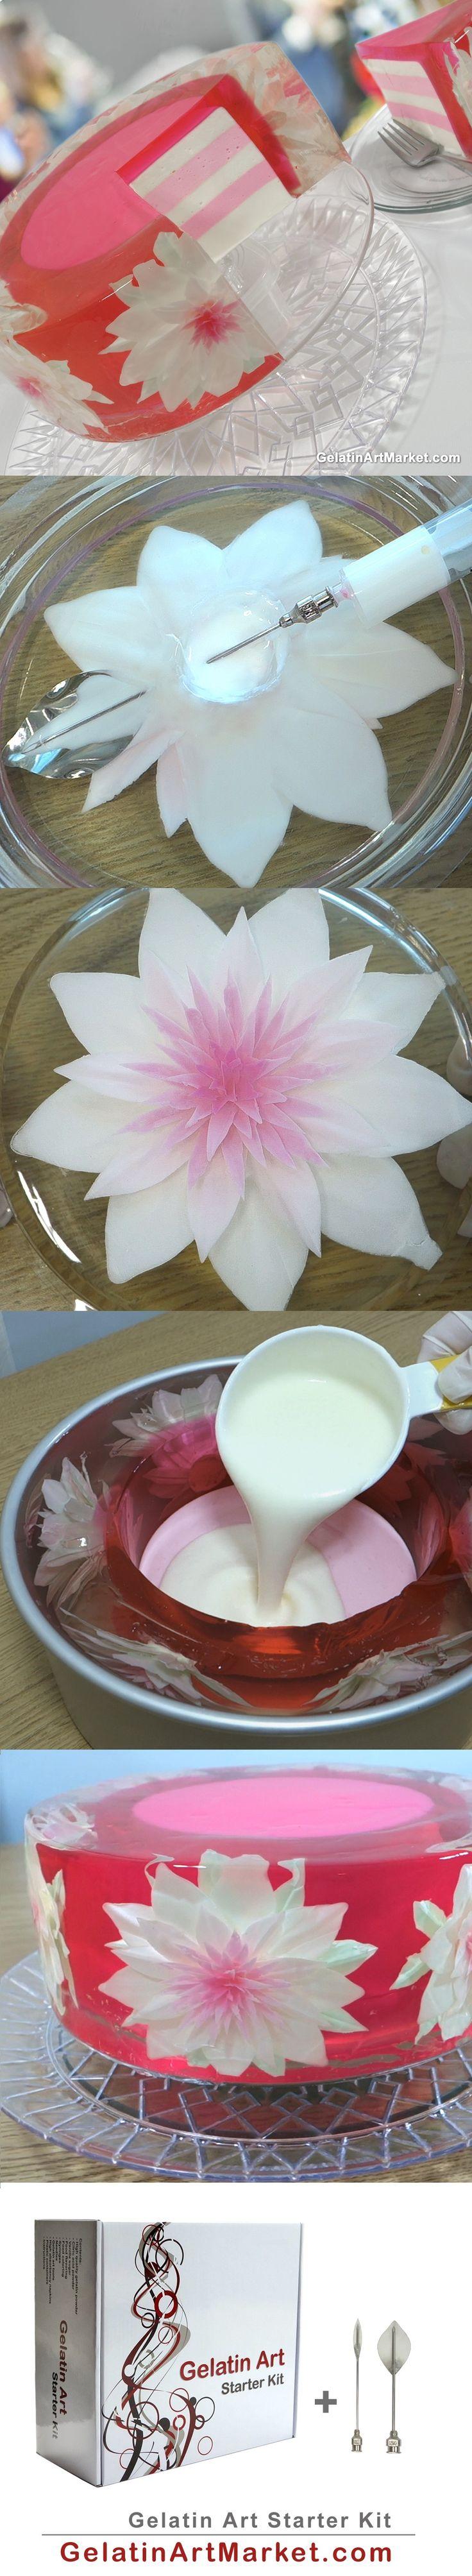 Learn how to make a beautiful pink Gelatin Art Cake. GelatinArtMarket.com